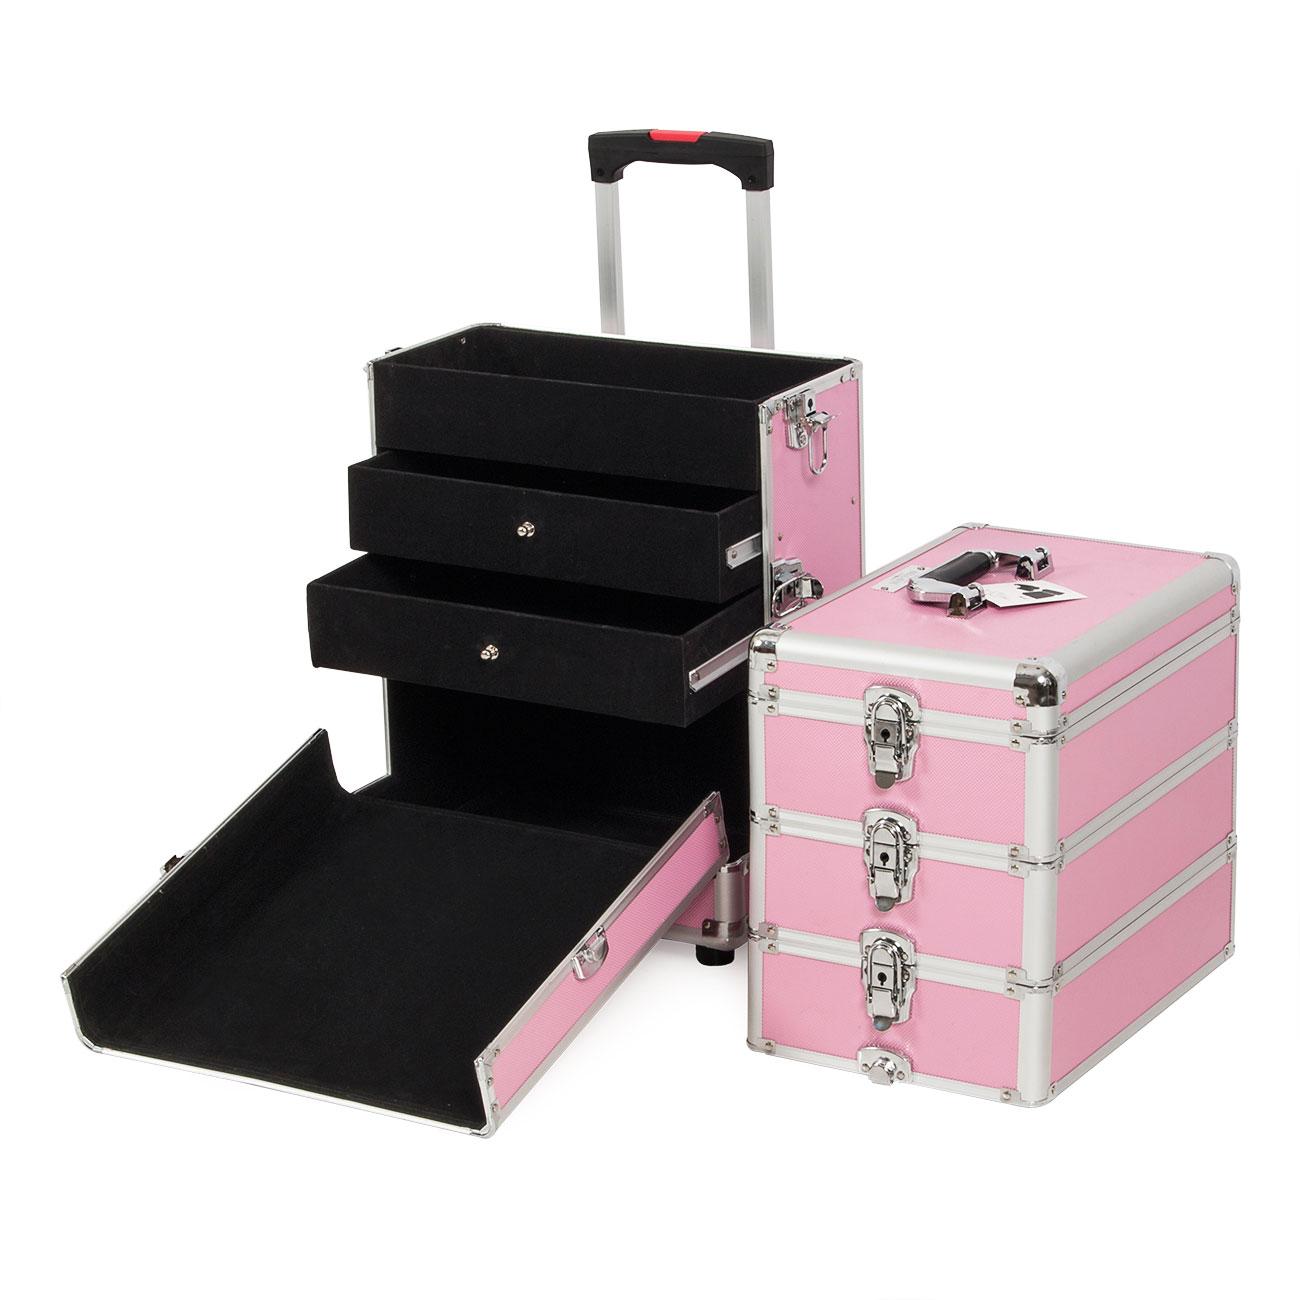 Makeup organizer on wheels